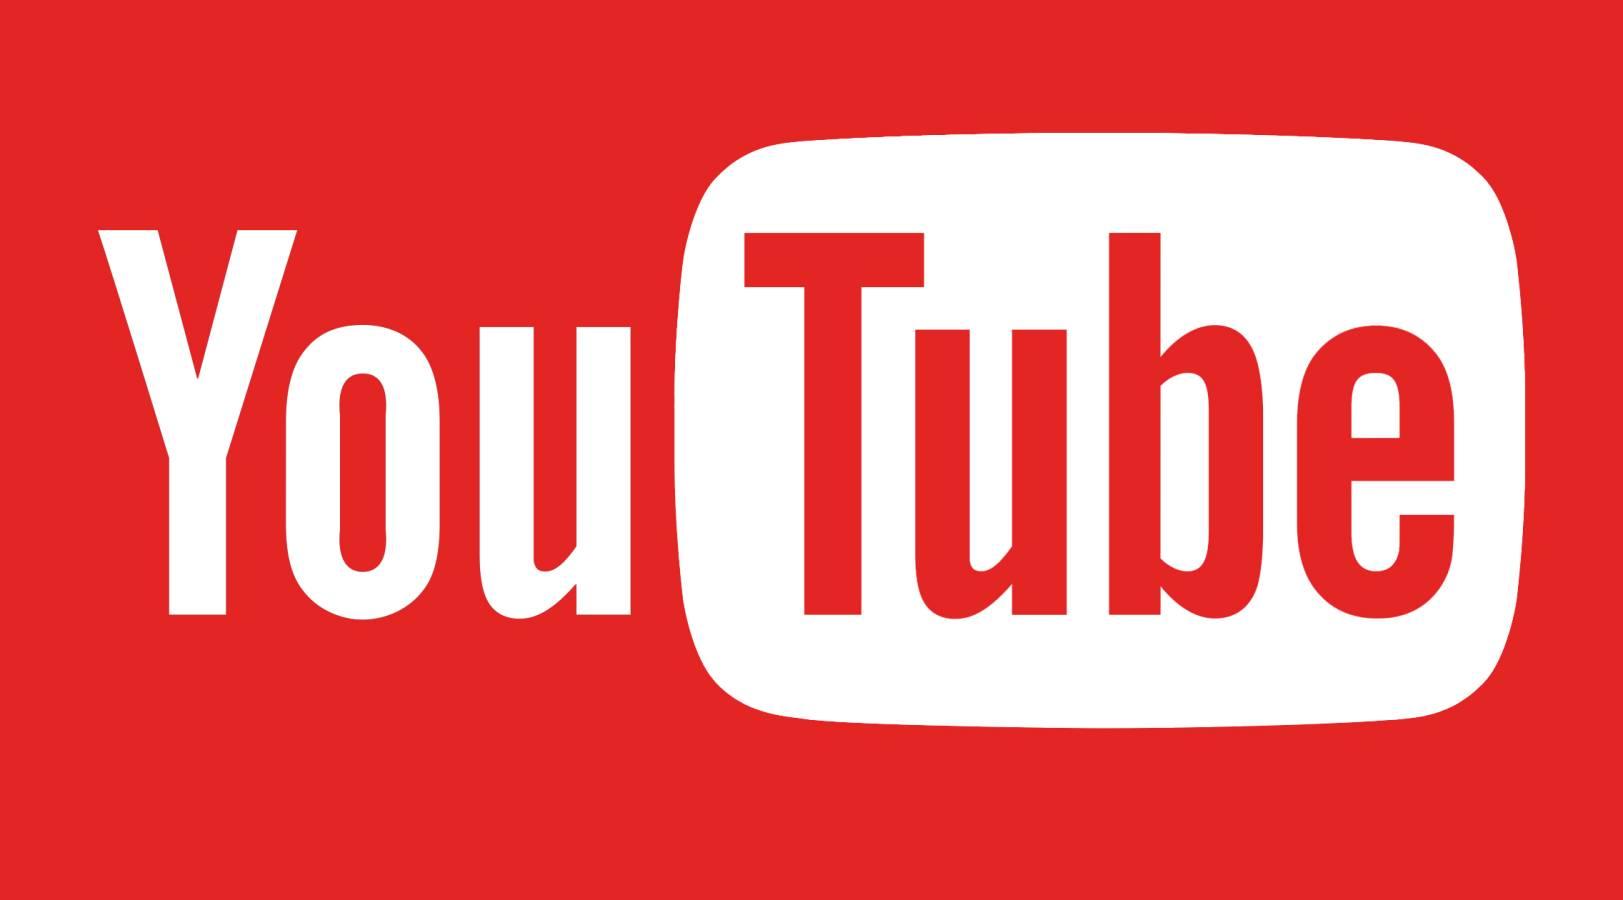 YouTube Actualizarea Noua, ce Schimbari Aduce in Telefoane